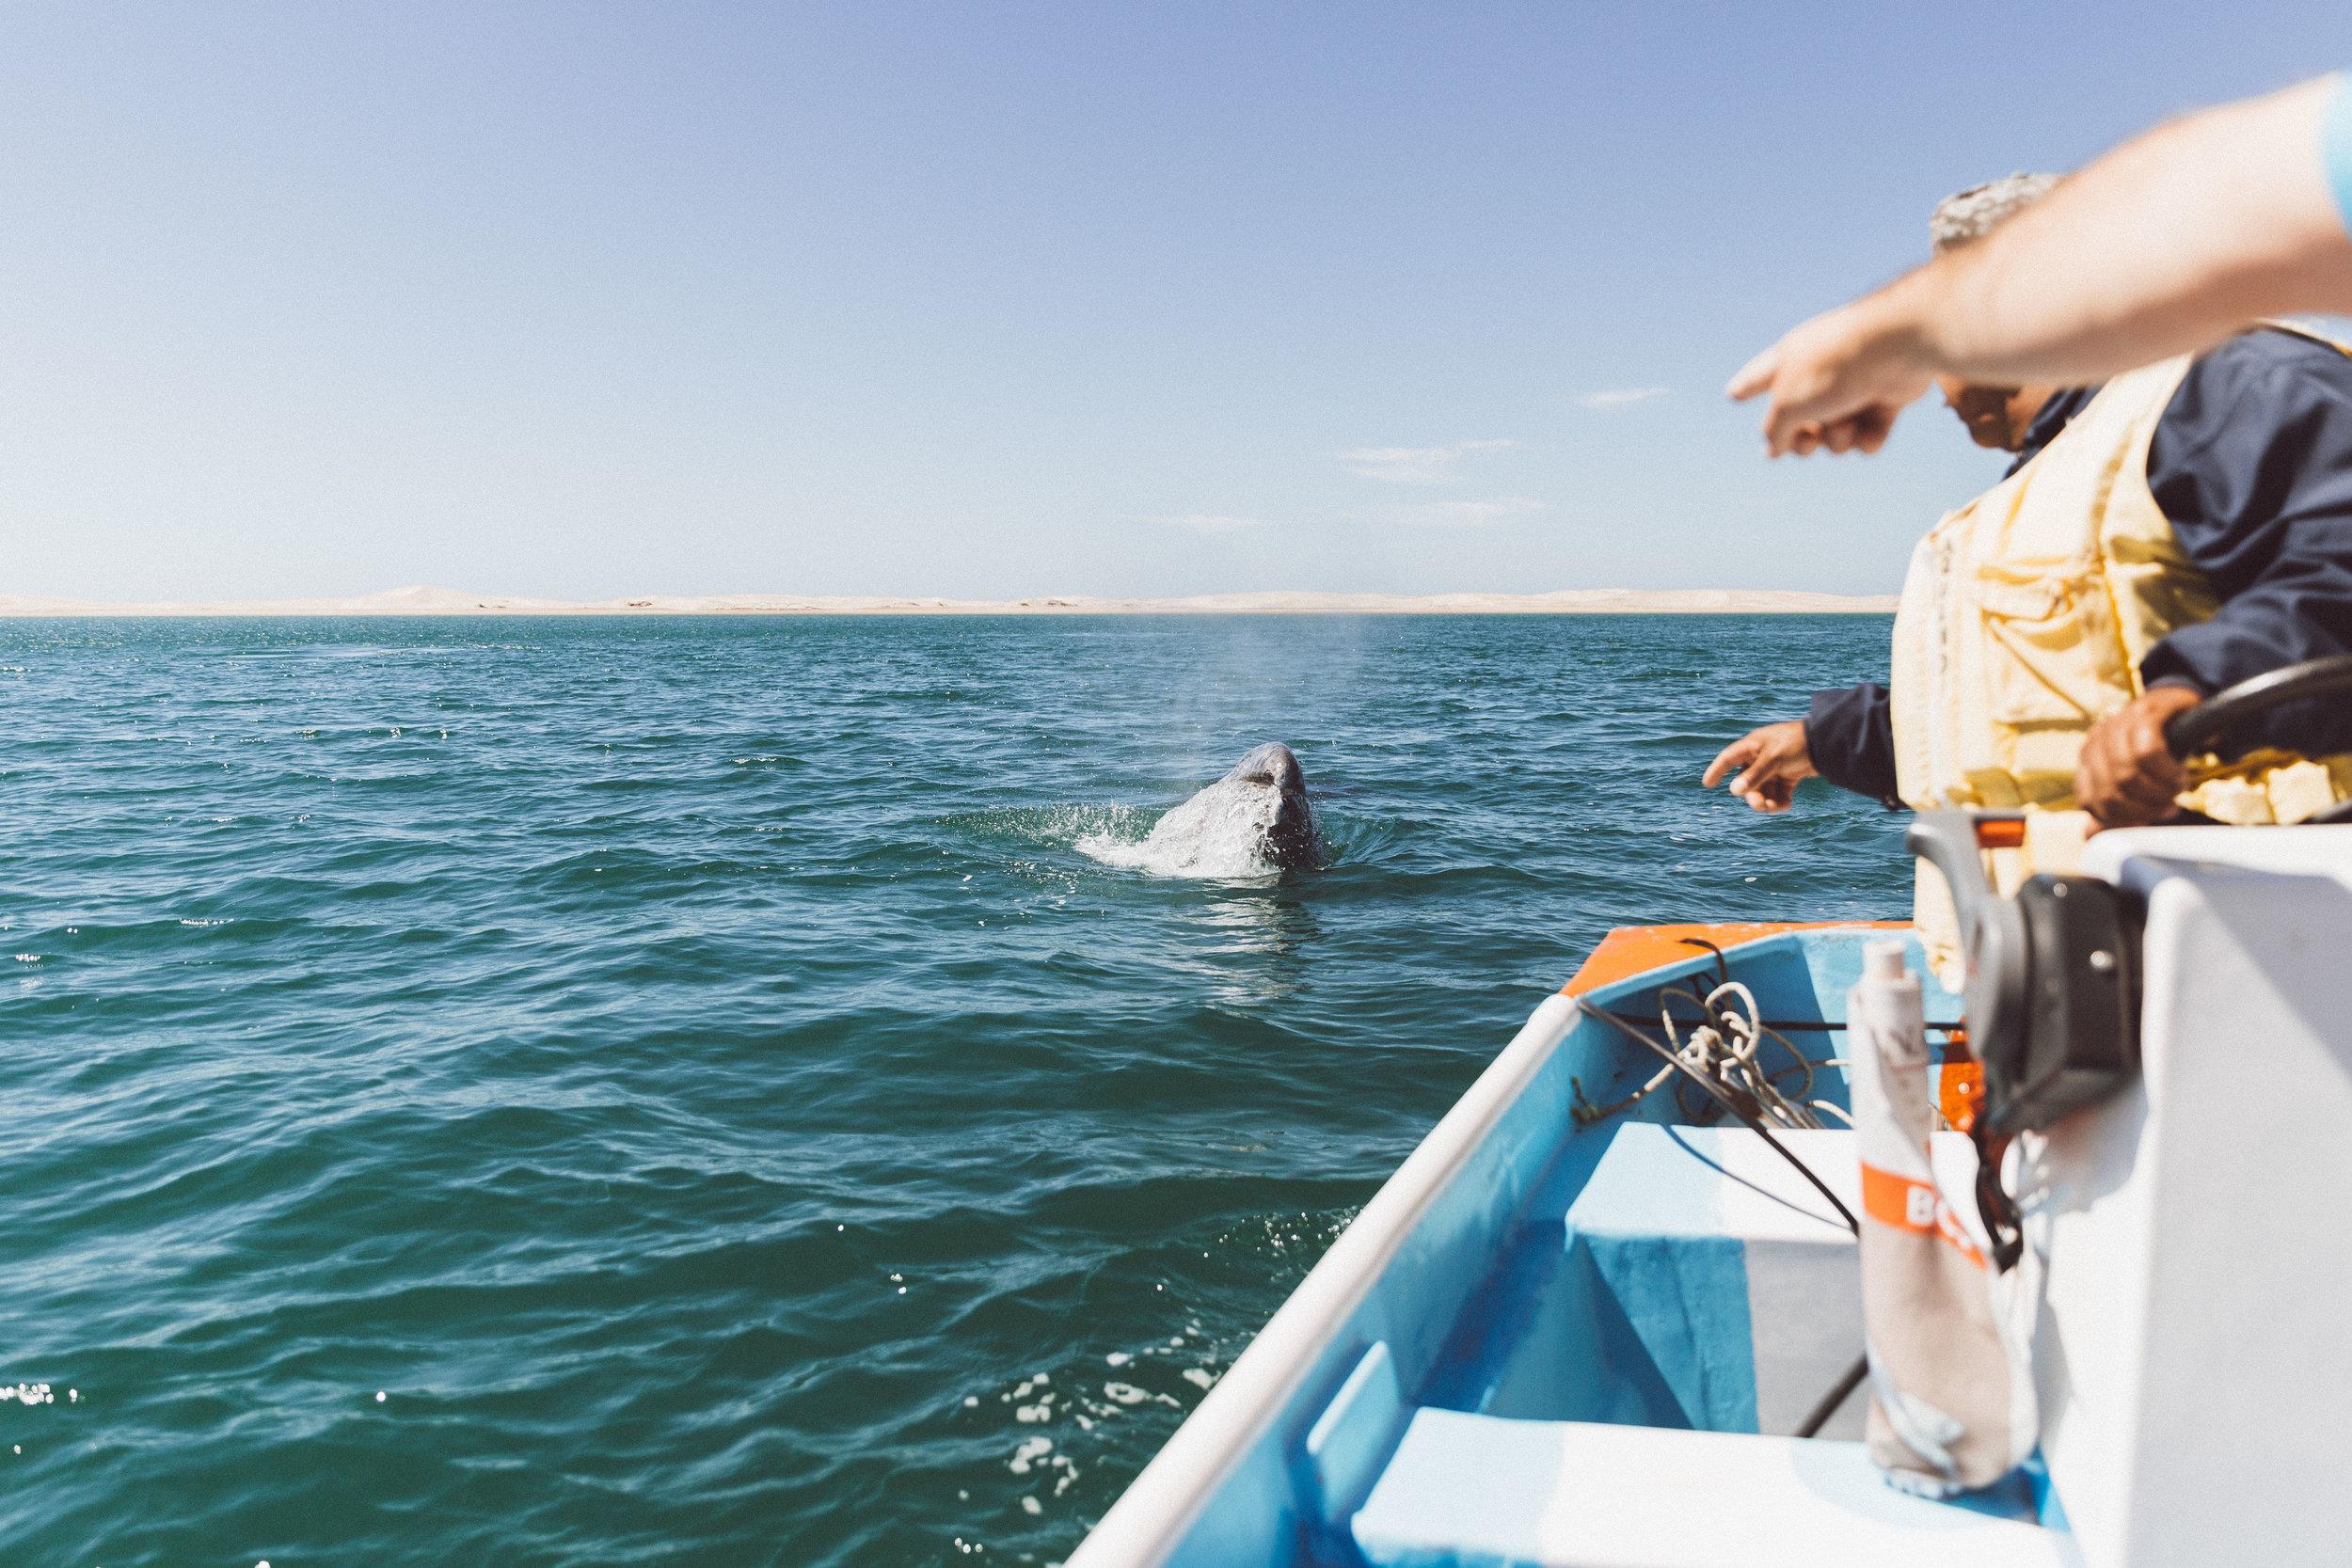 whale-wathcing-mexico-samlandreth